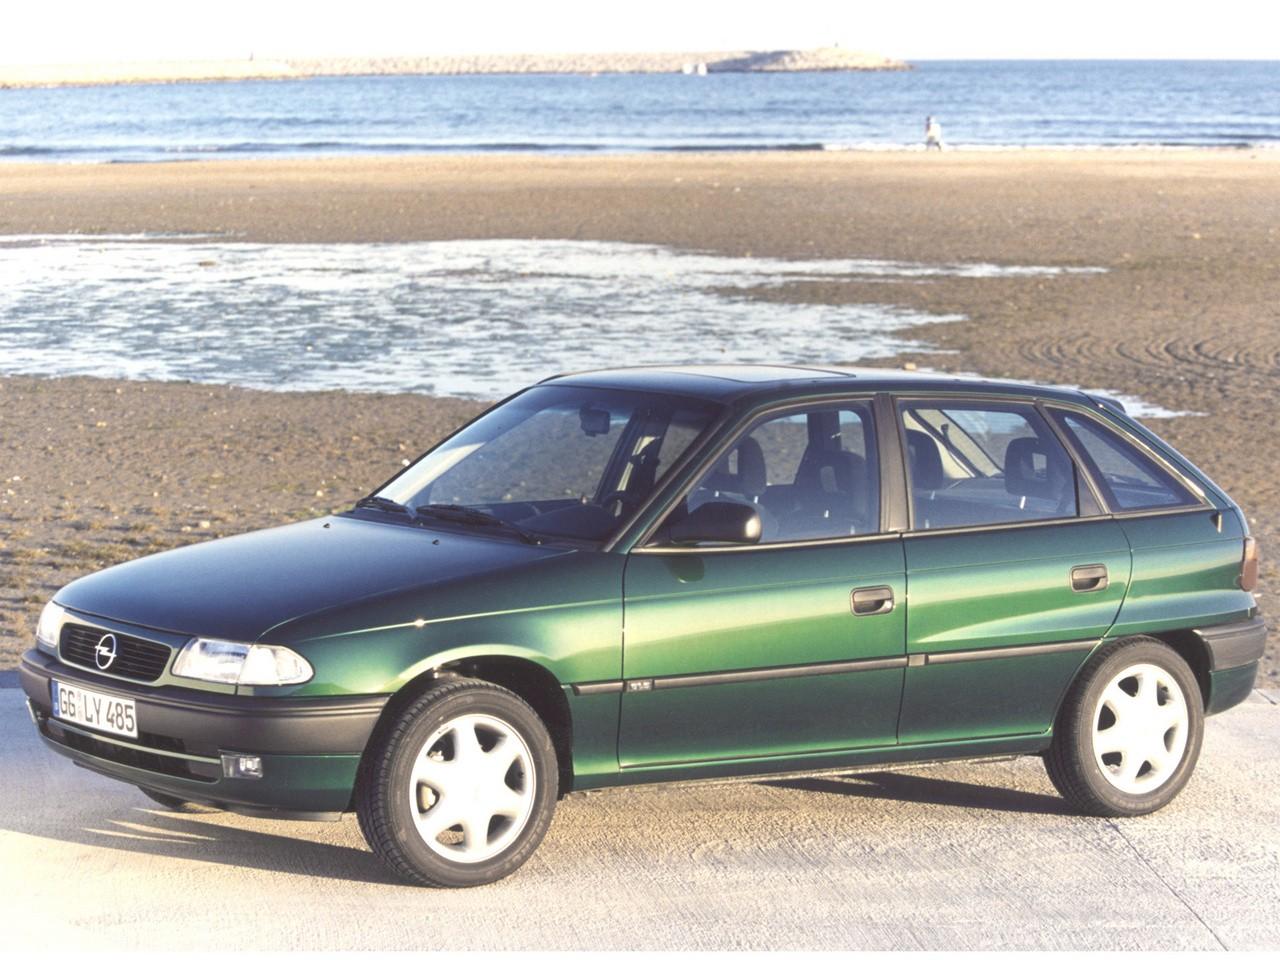 opel astra 5 doors specs photos 1994 1995 1996 1997 1998 autoevolution. Black Bedroom Furniture Sets. Home Design Ideas